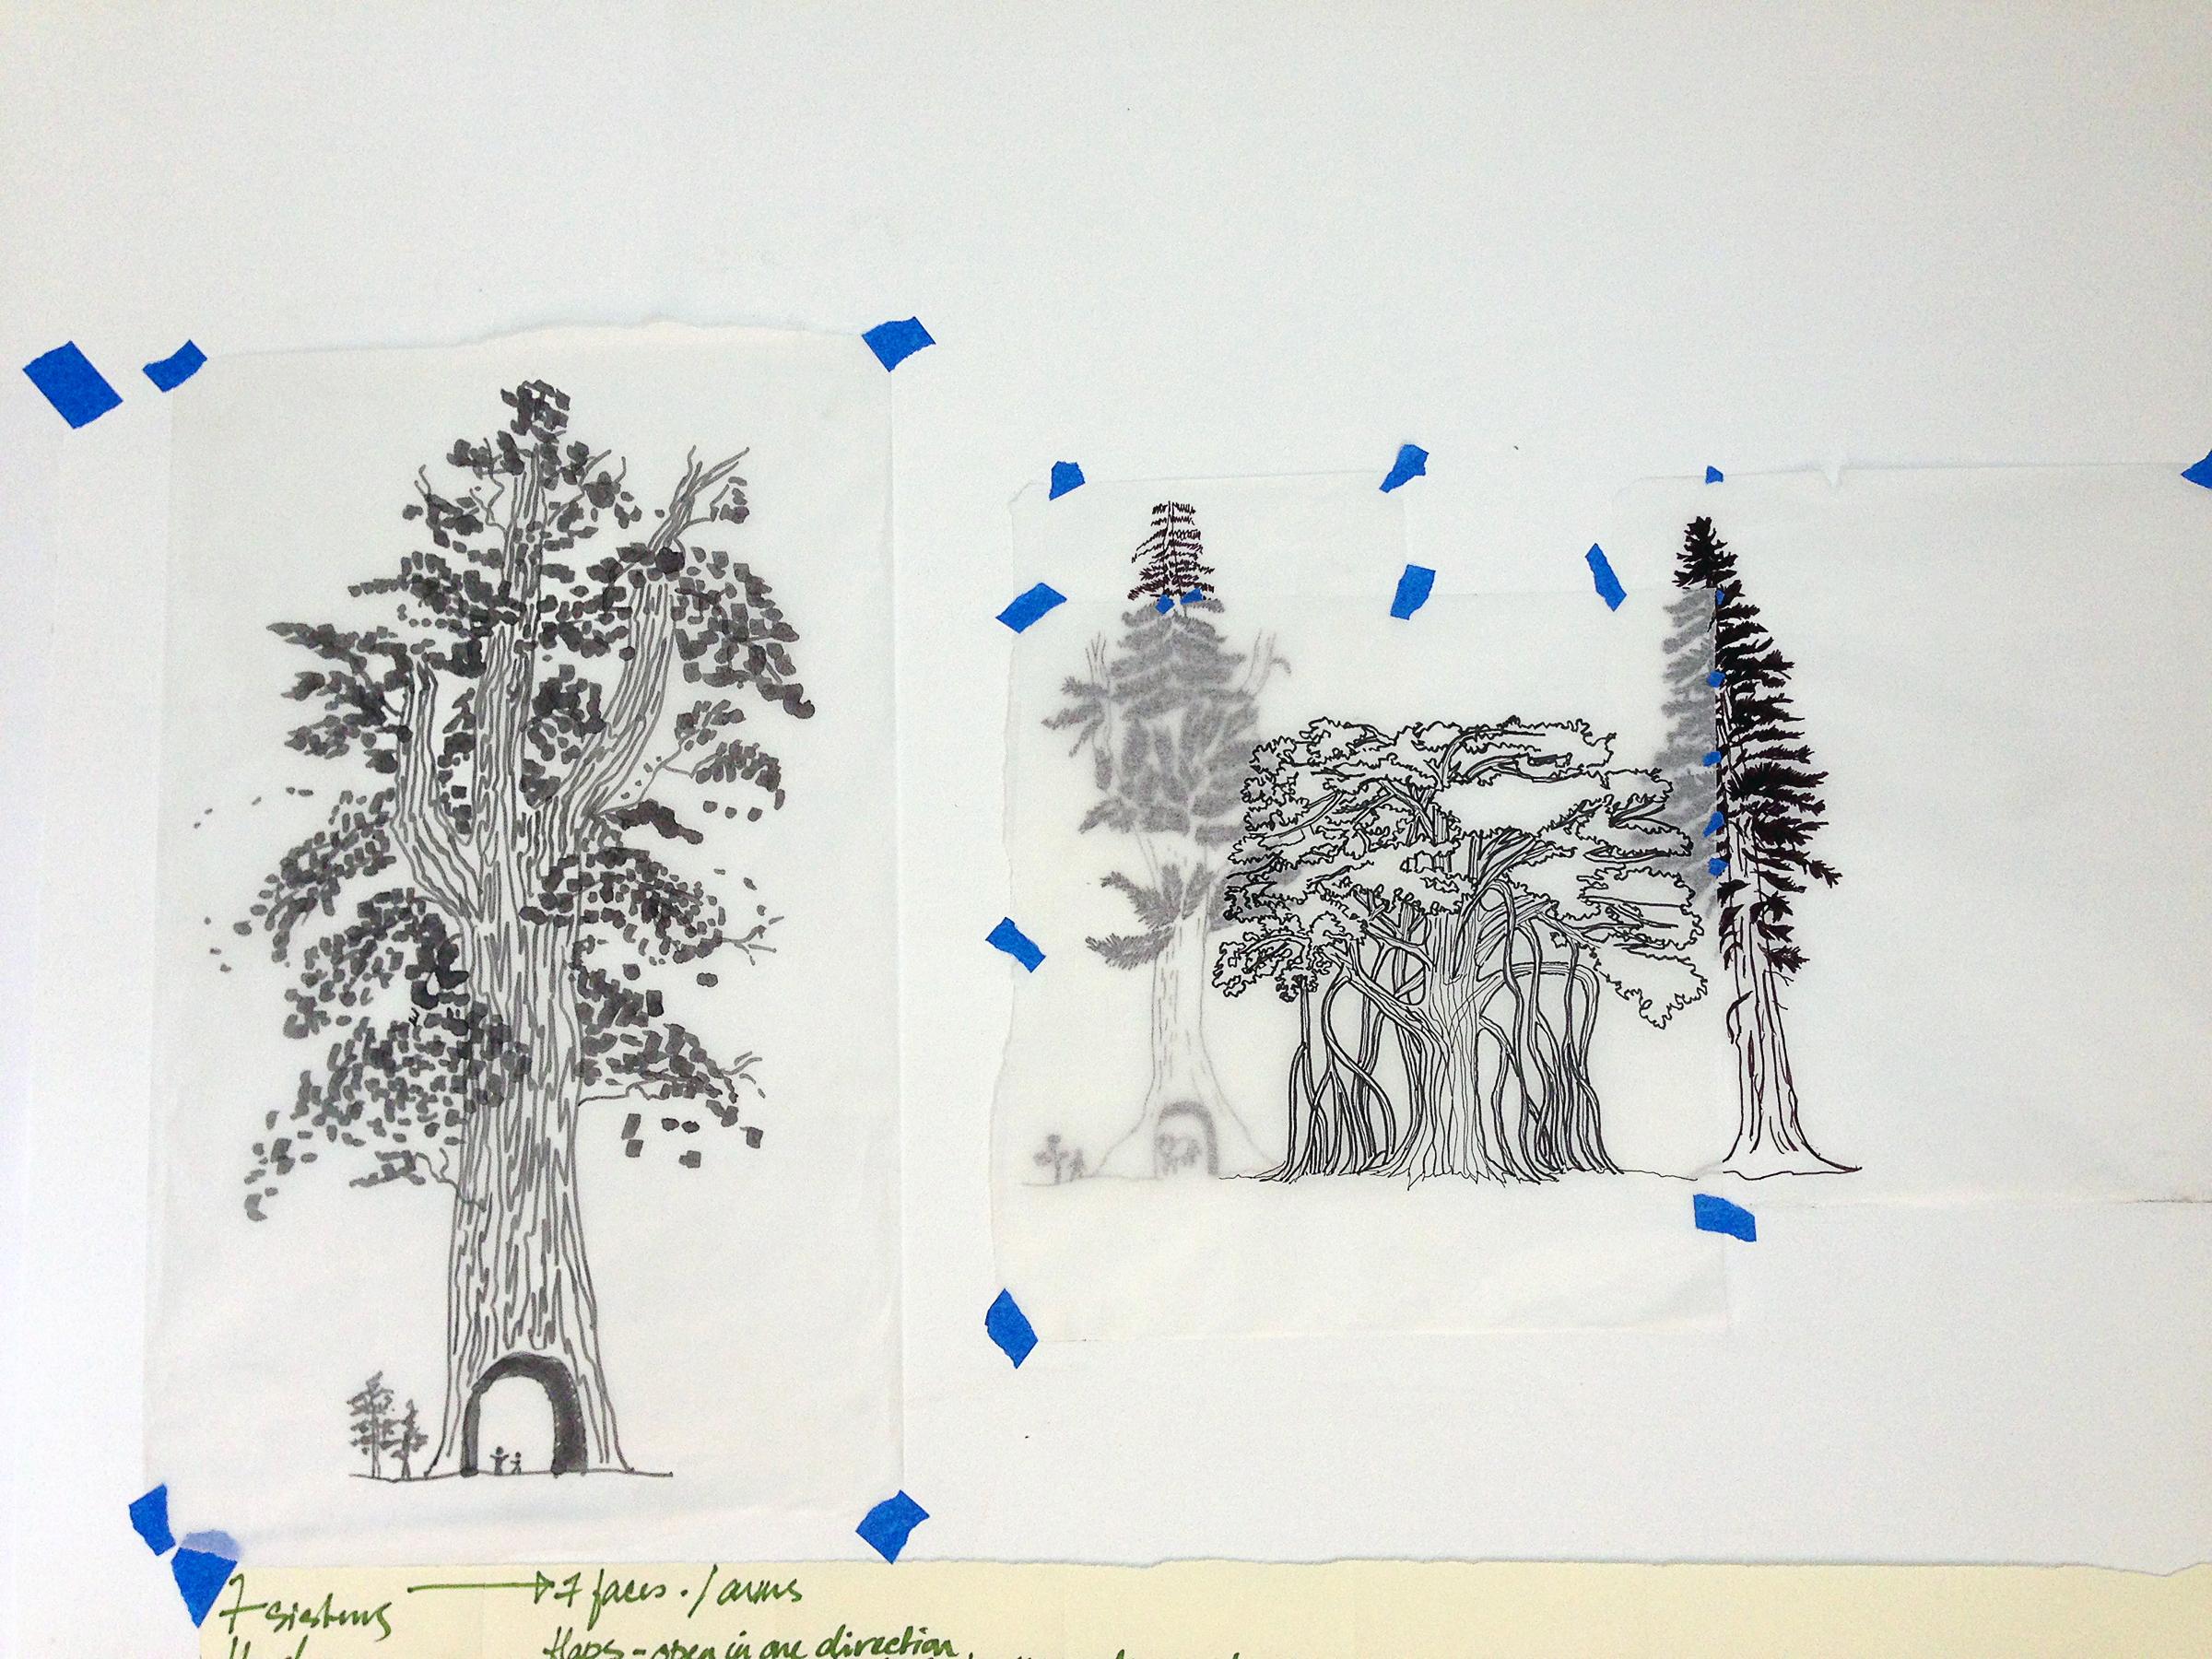 tree drawings for henna IMG_2276.jpg